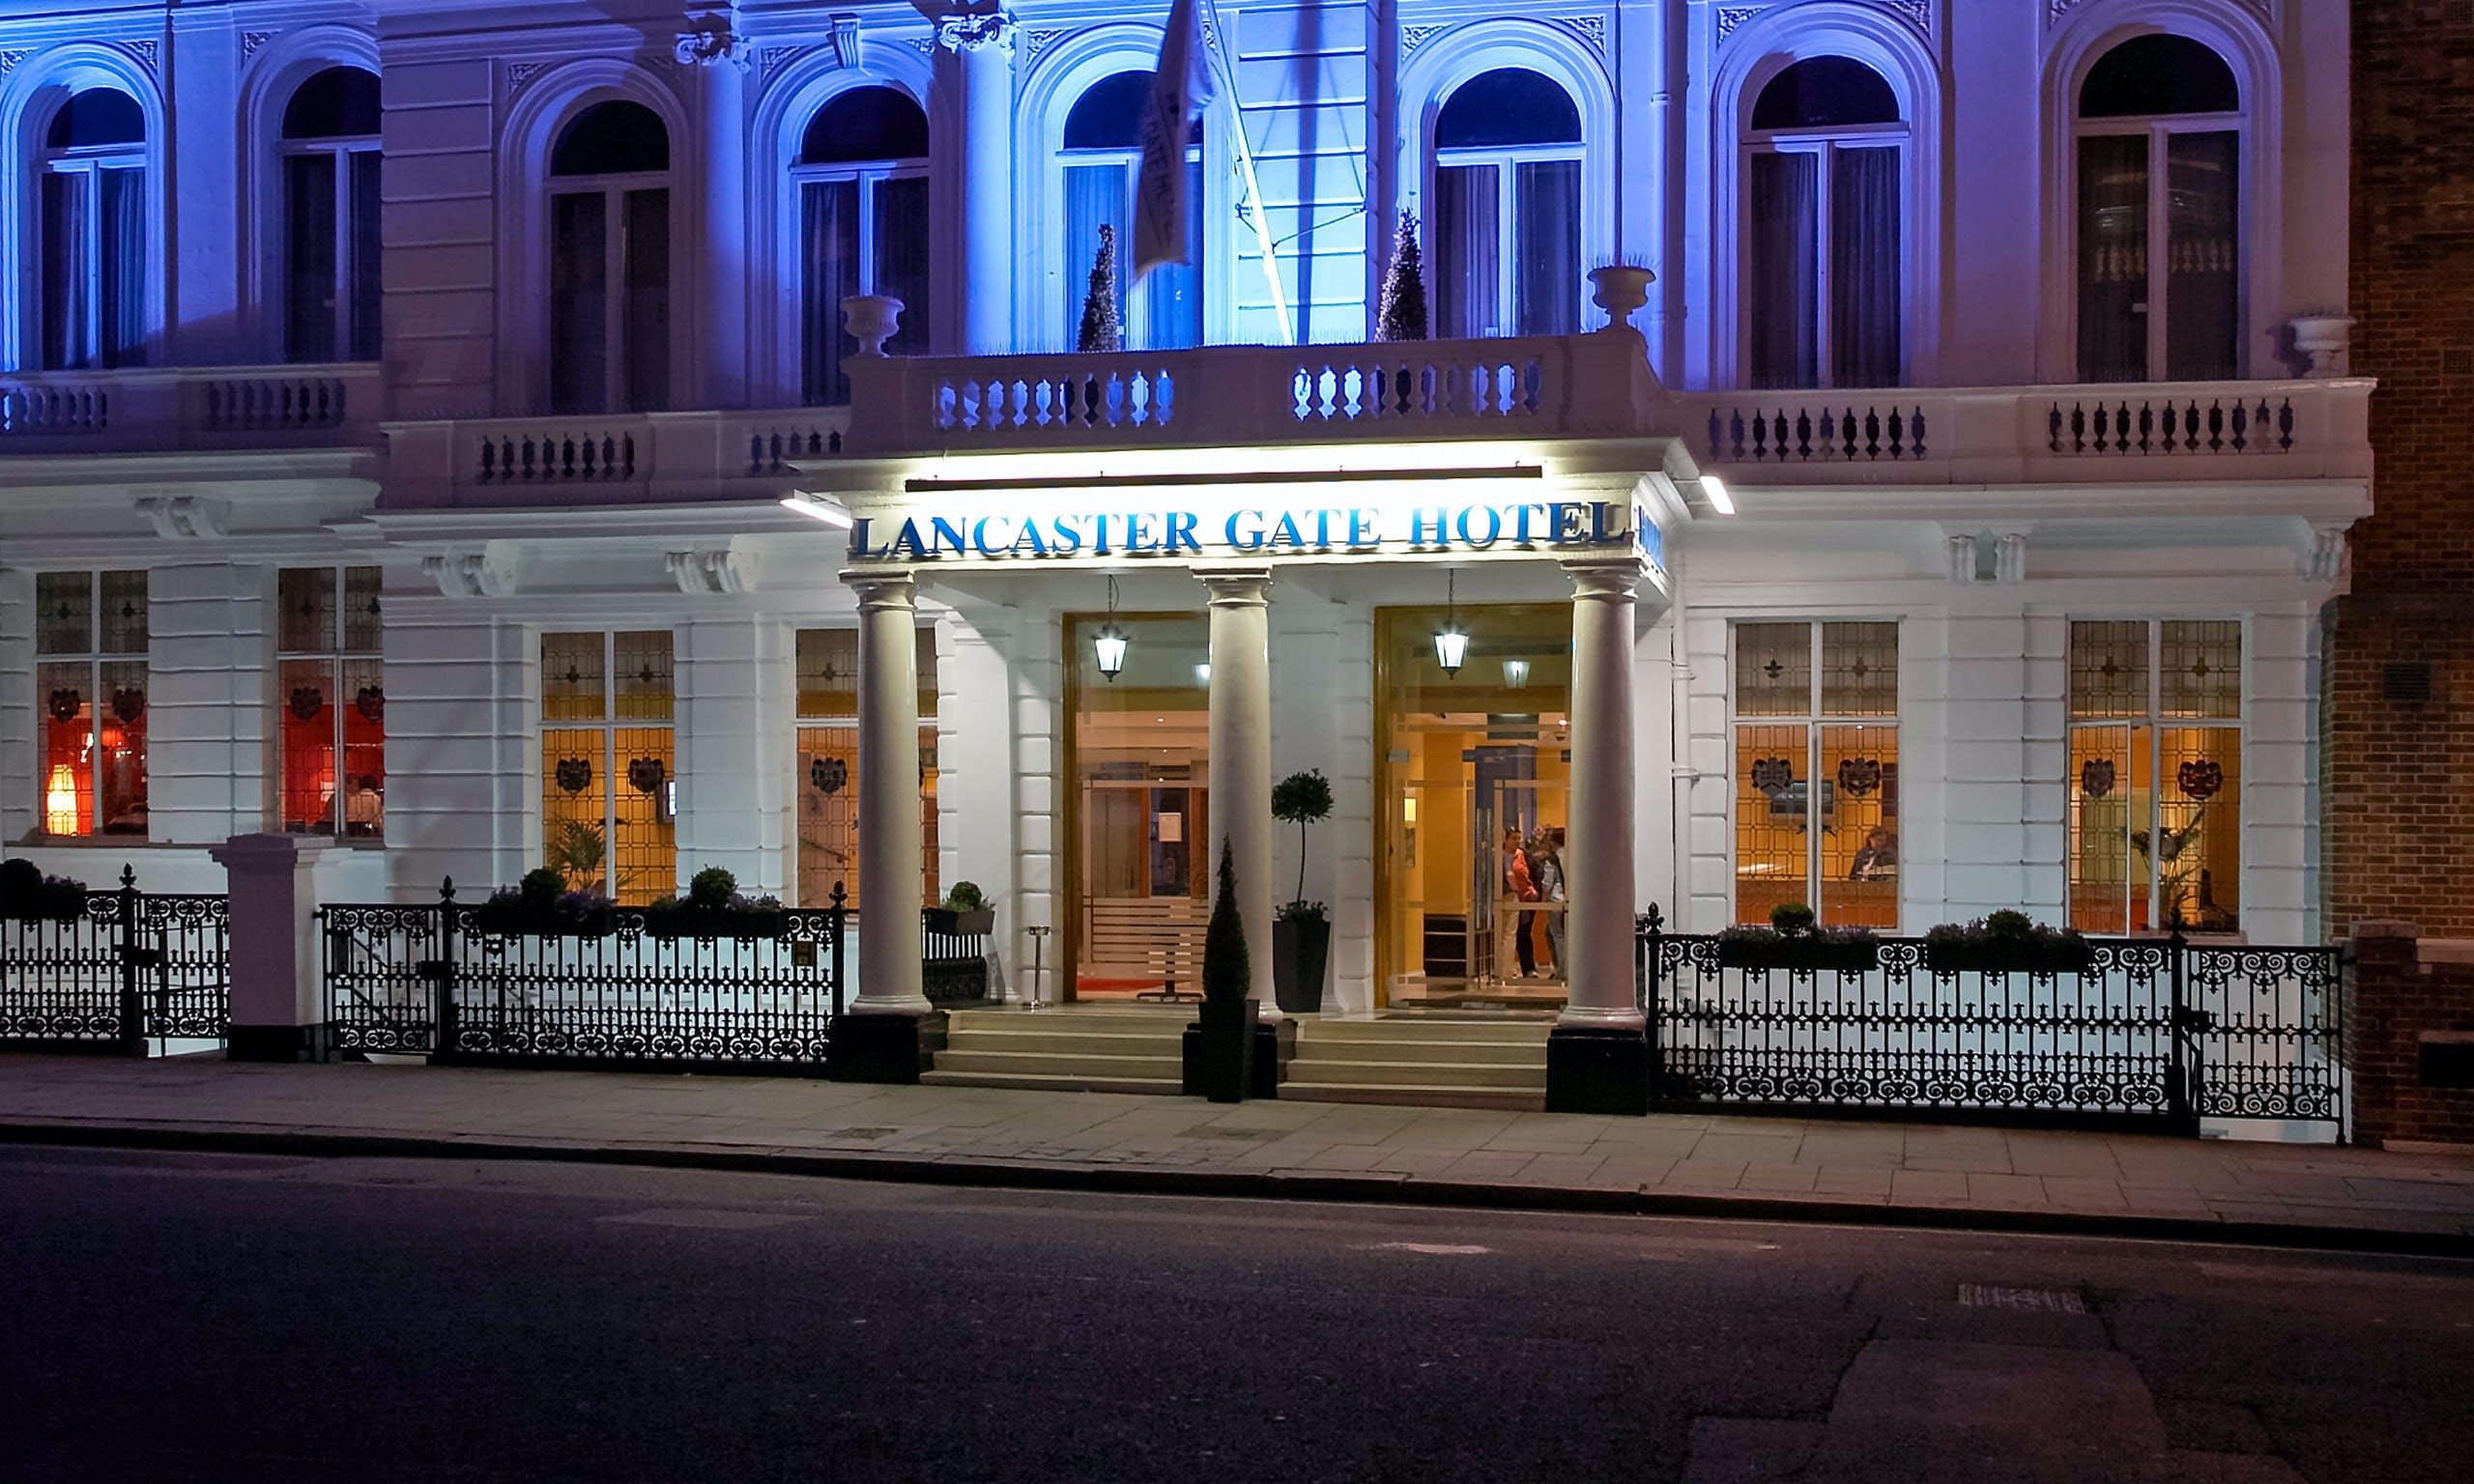 Lancaster Gate Hotel London Hoteltonight